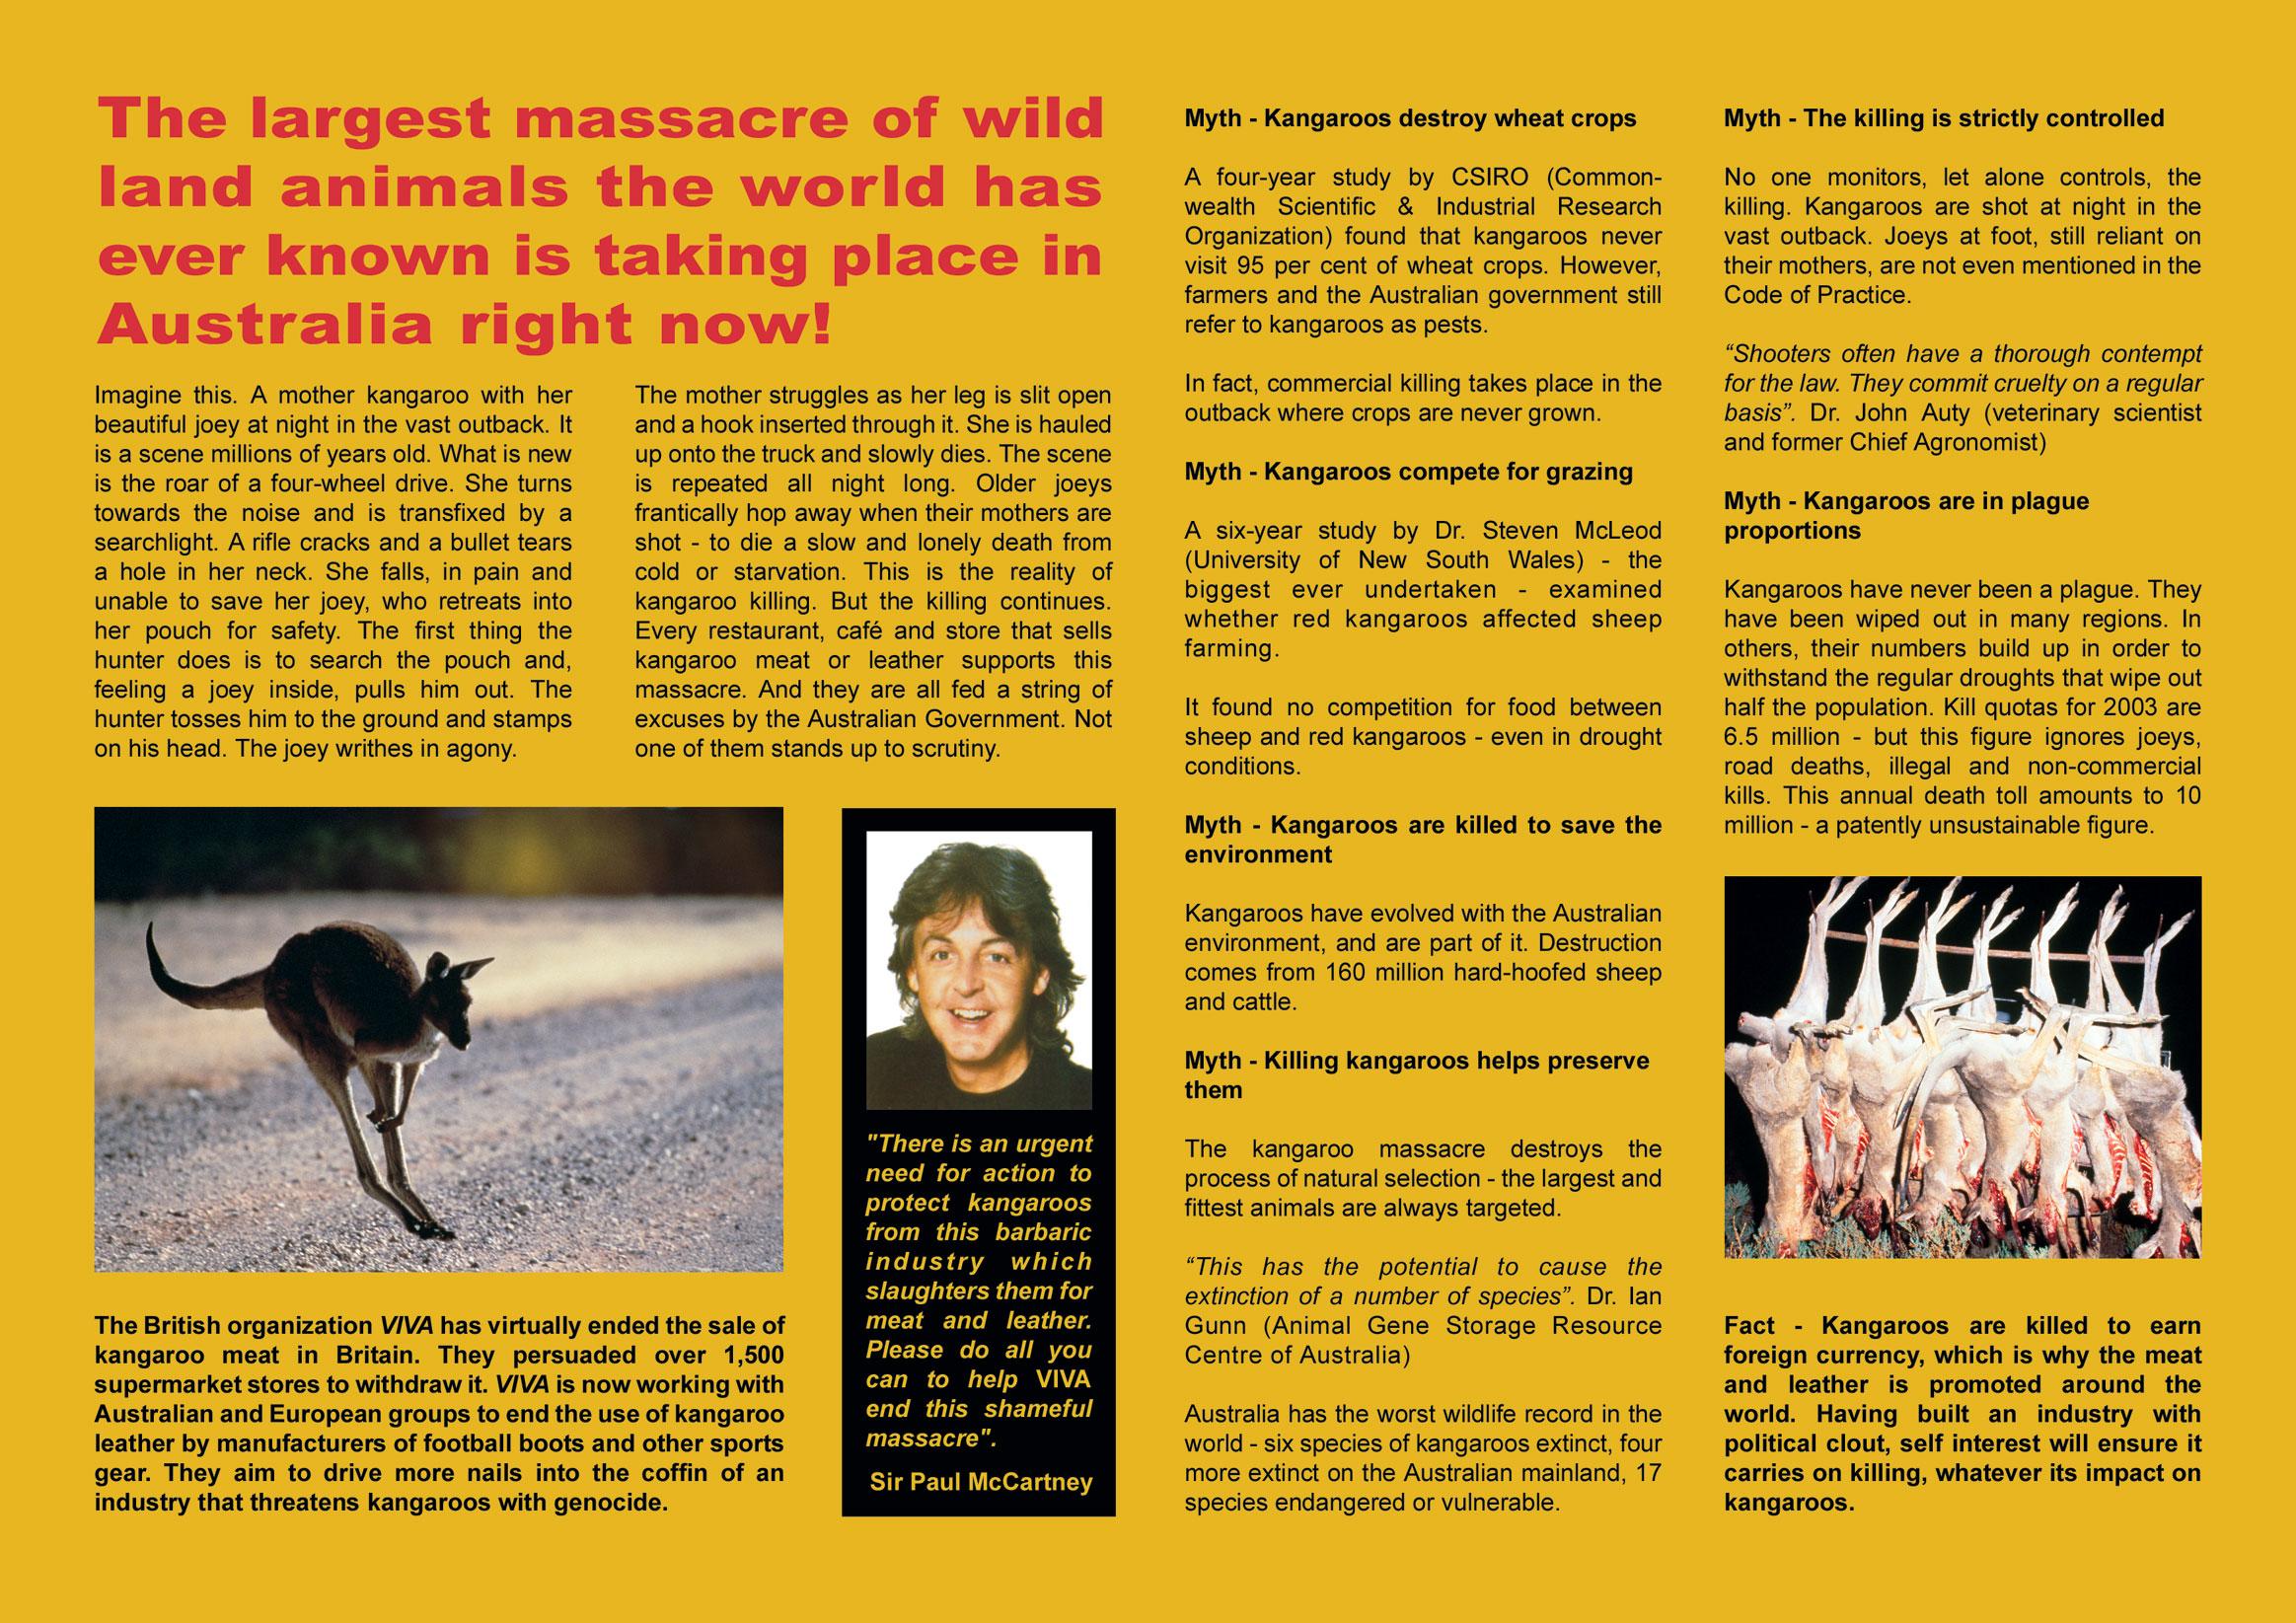 AFC - 06/26/03 Save the Kangaroos